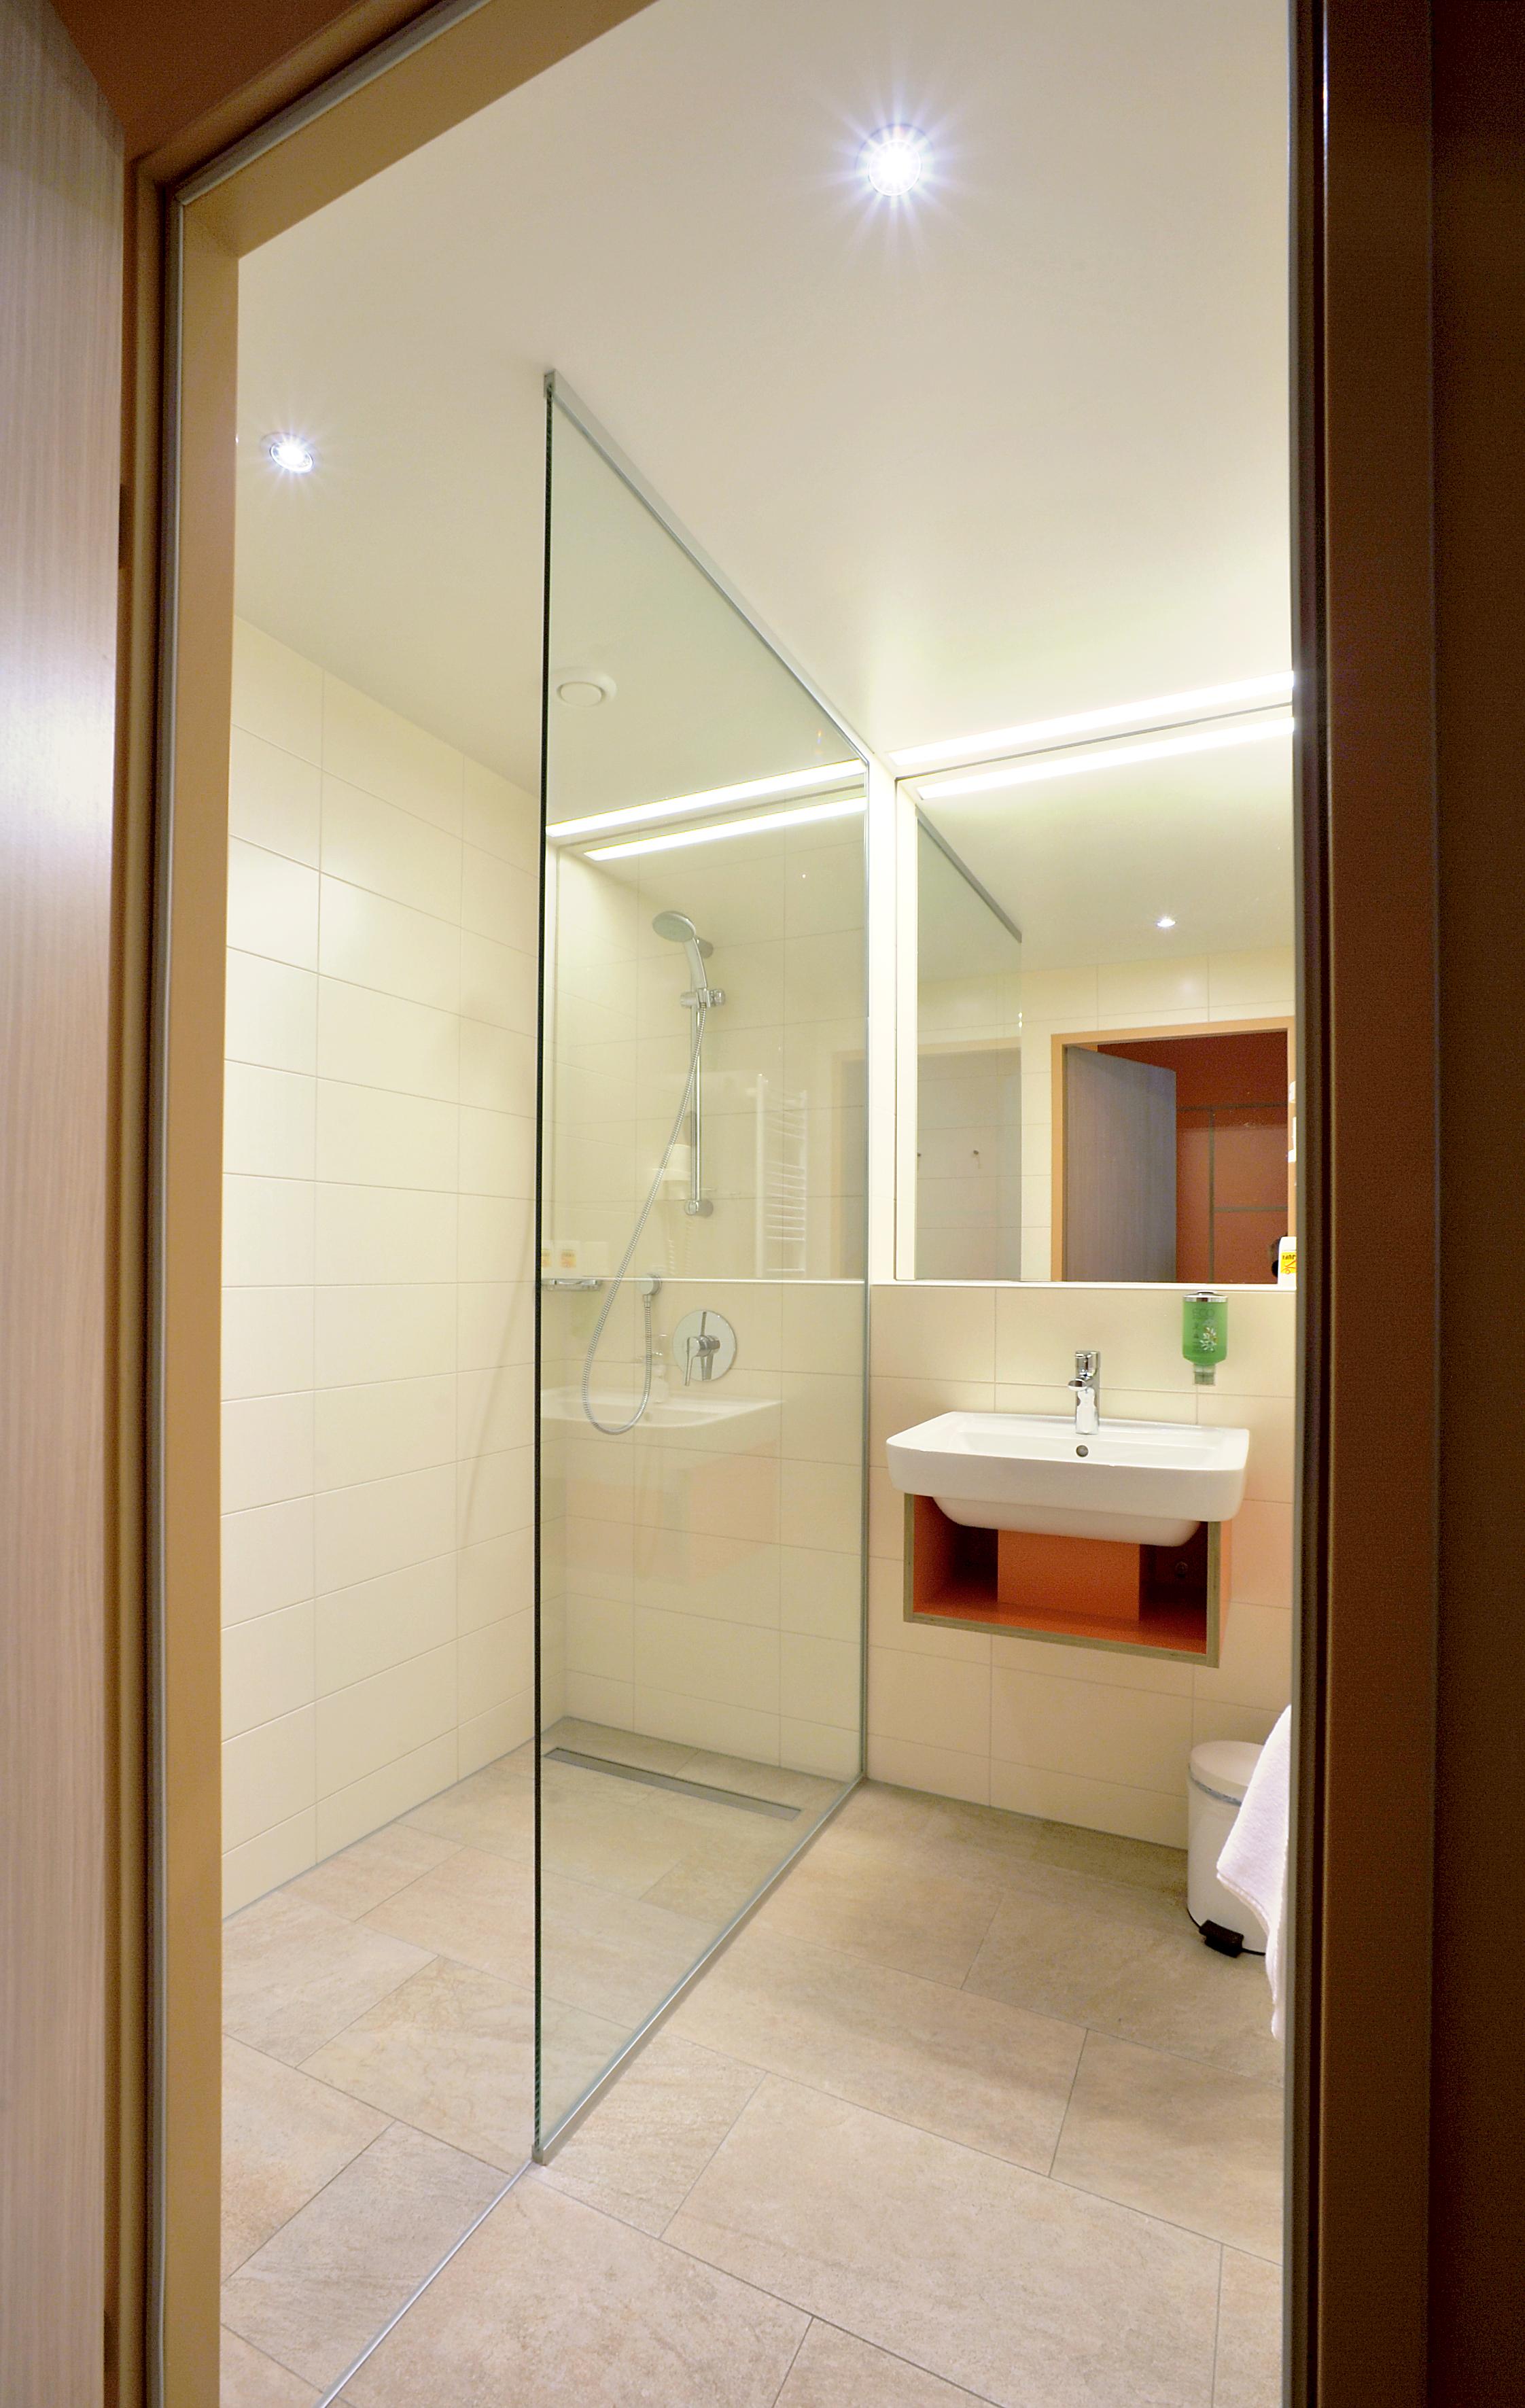 JUFA Hotel Wien City-Badezimmer